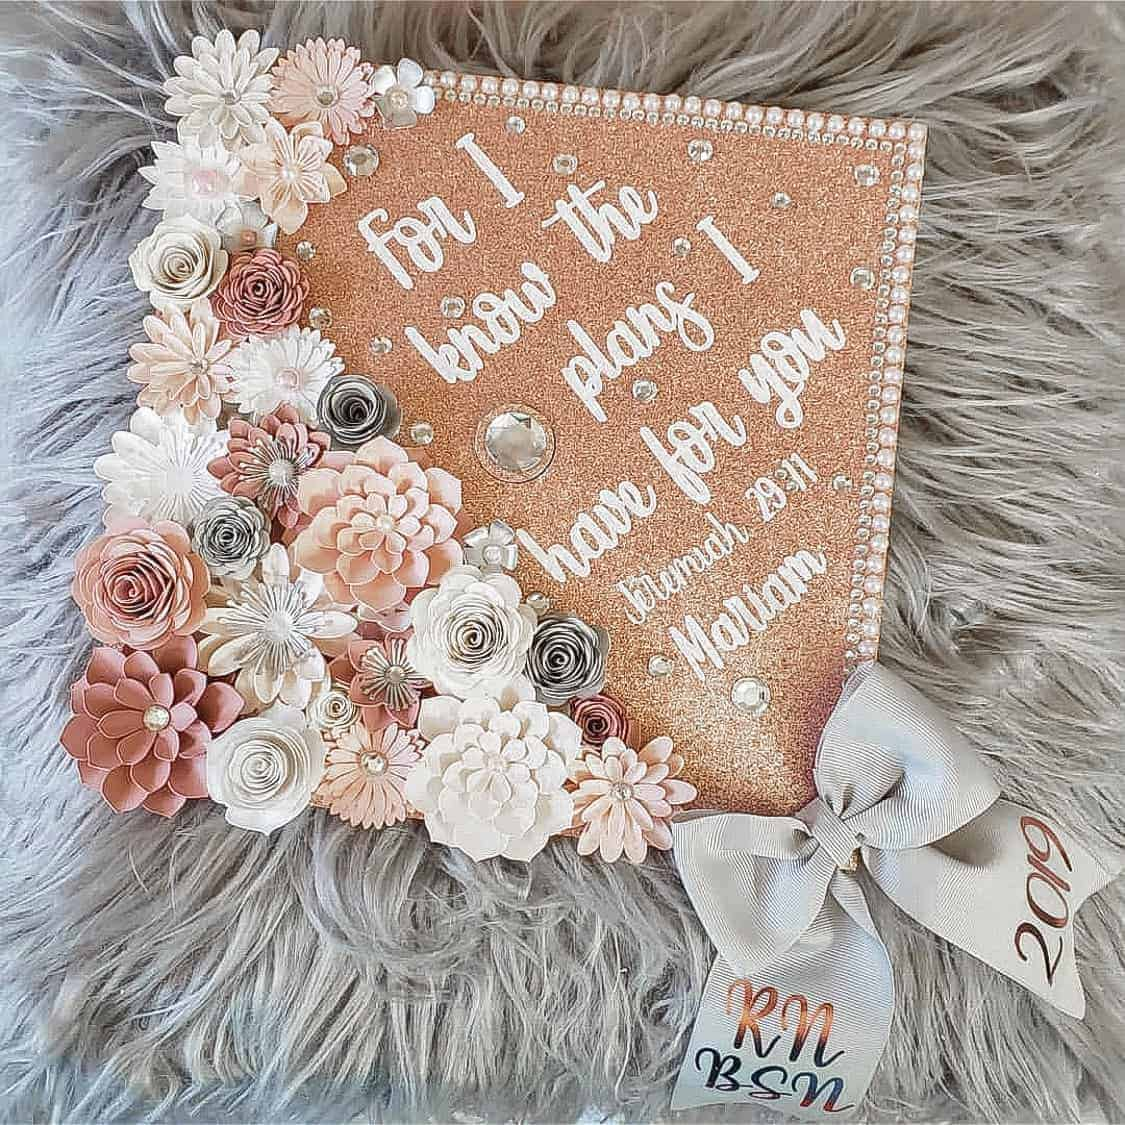 graduation-cap-designs